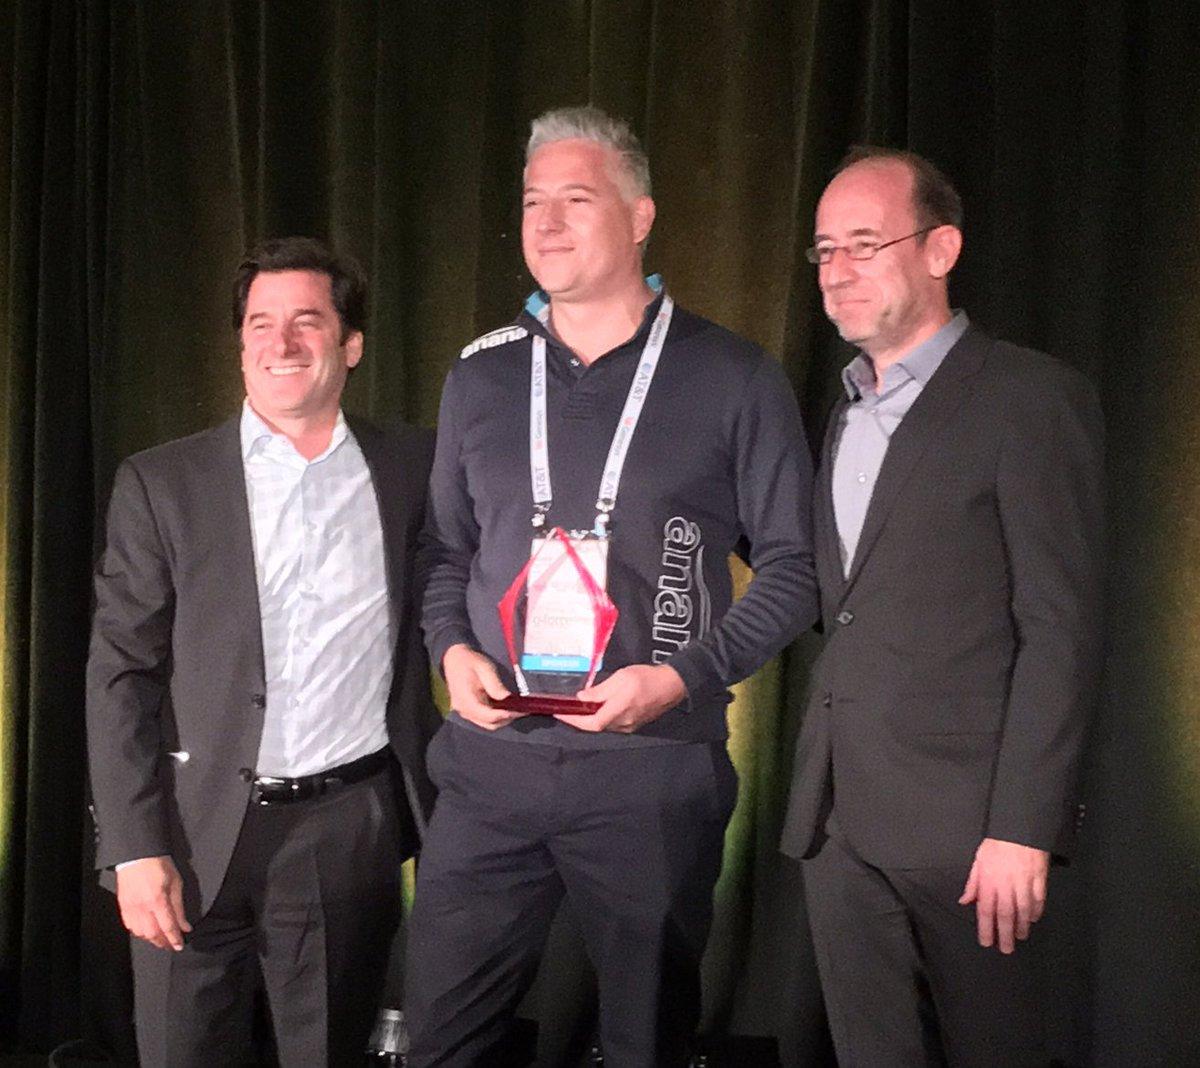 Congratulations @AnanaLTD - winner of the Genesys Partner Innovations Award for Technology! #GForce15 https://t.co/sYlUqSQ1Tz